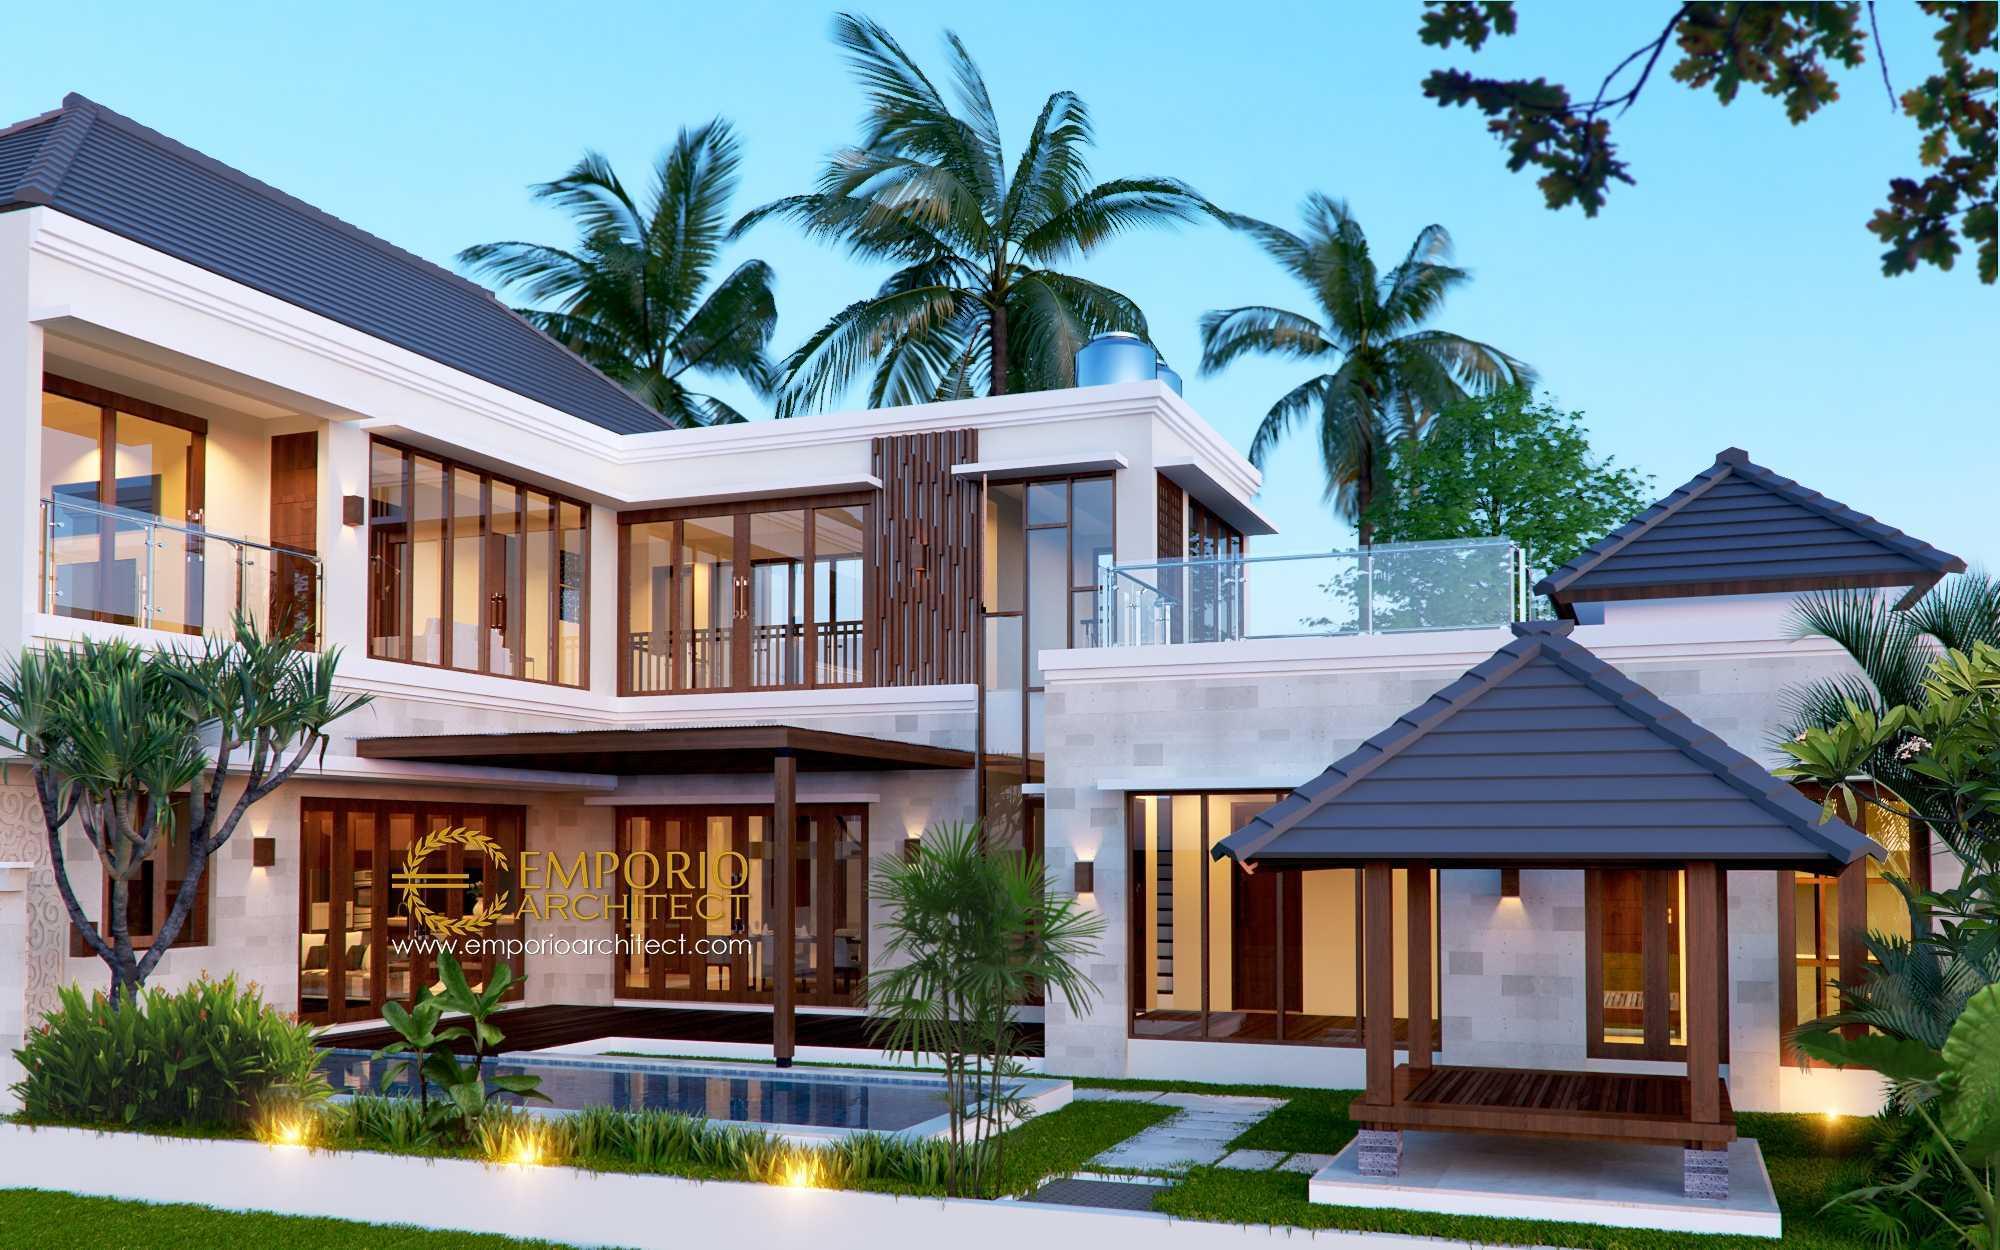 Emporio Architect Desain Rumah Villa Bali Tropis 381 @ Jawa Tengah Jawa Tengah, Indonesia Jawa Tengah, Indonesia Emporio-Architect-Desain-Rumah-Villa-Bali-Tropis-381-Jawa-Tengah   76576